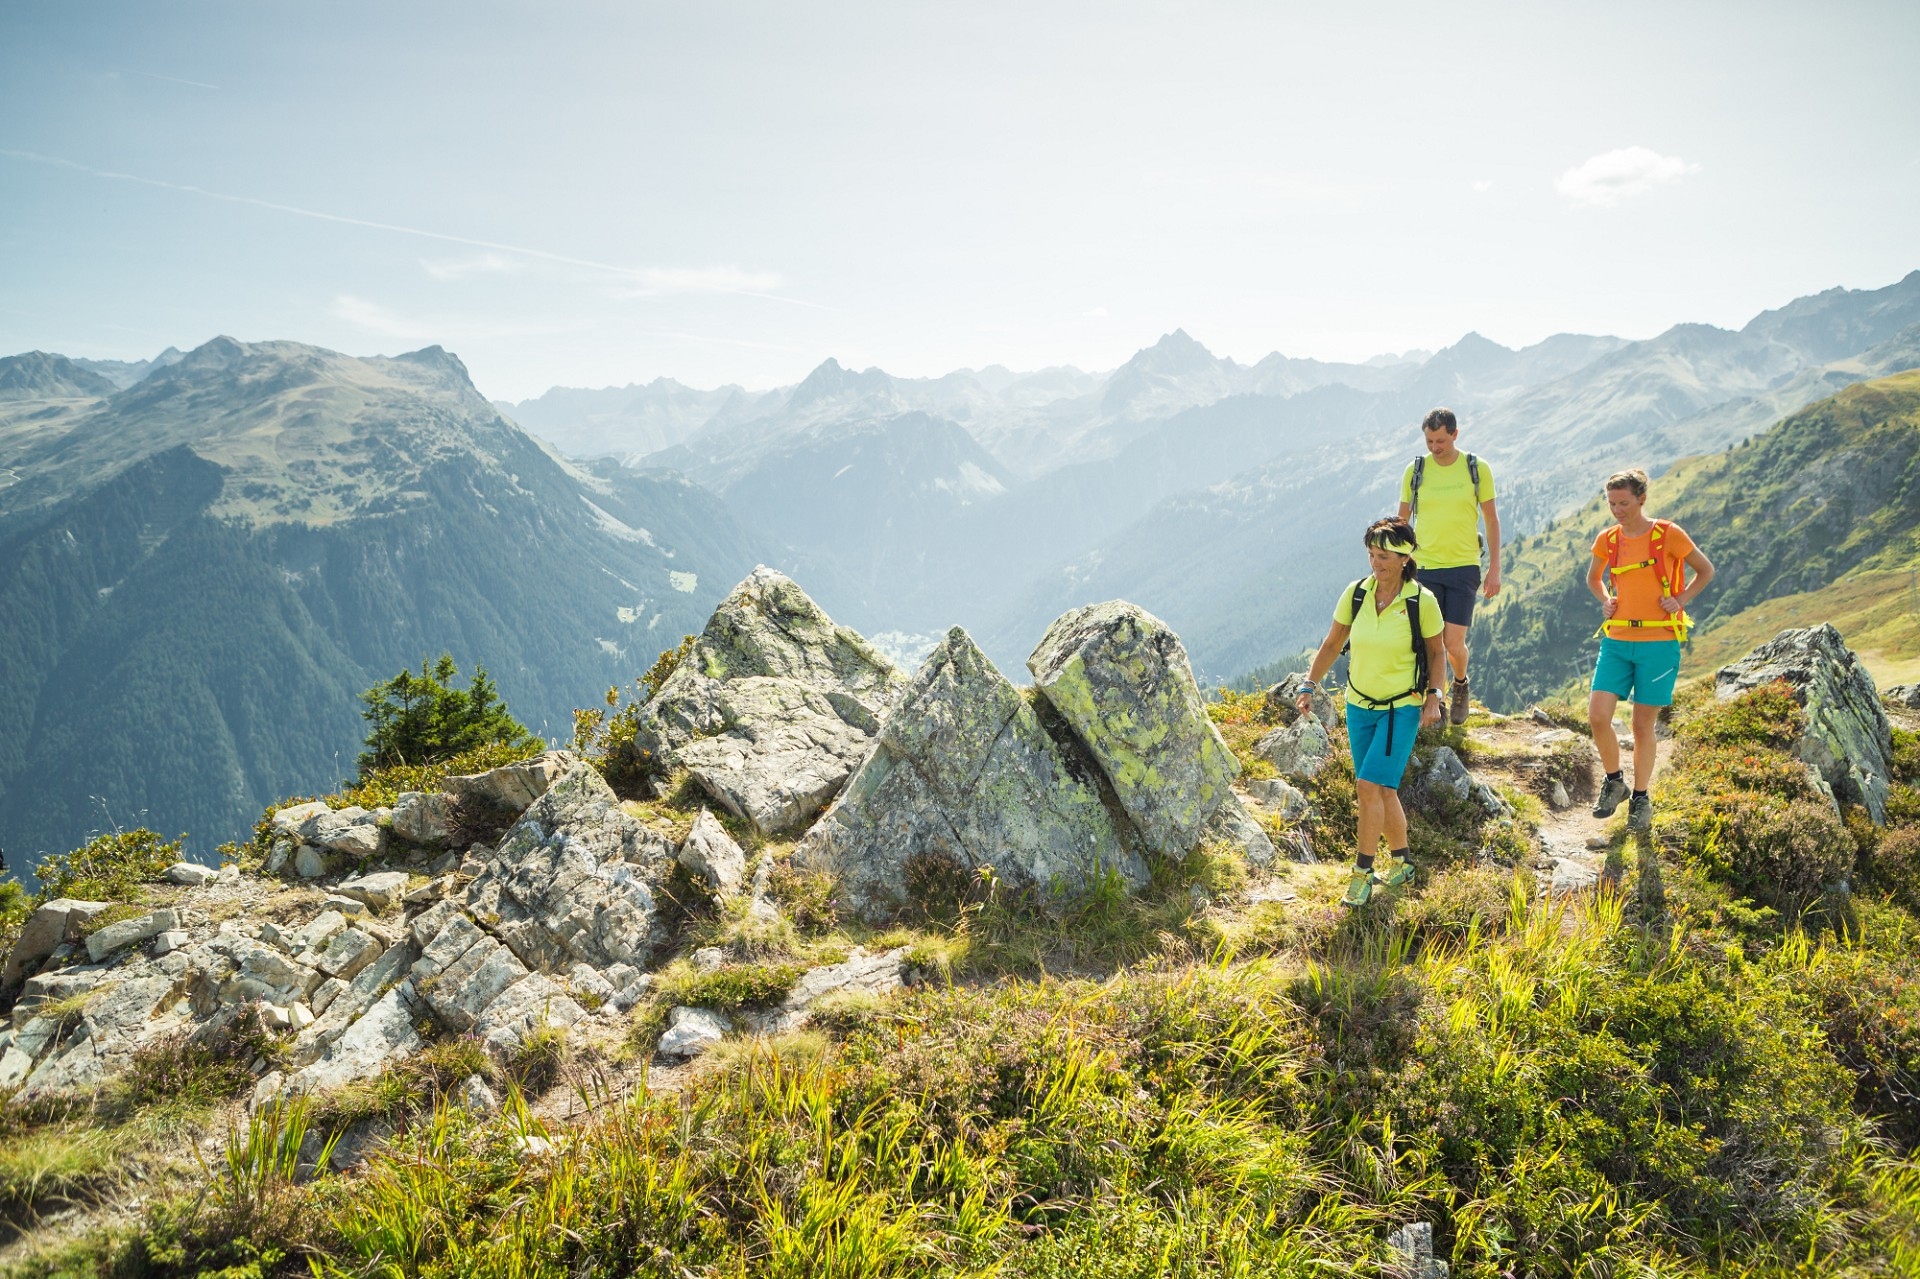 Wanderung über den Gantekopf zur Alp Nova (c) Stefan Kothner - Montafon Tourismus GmbH